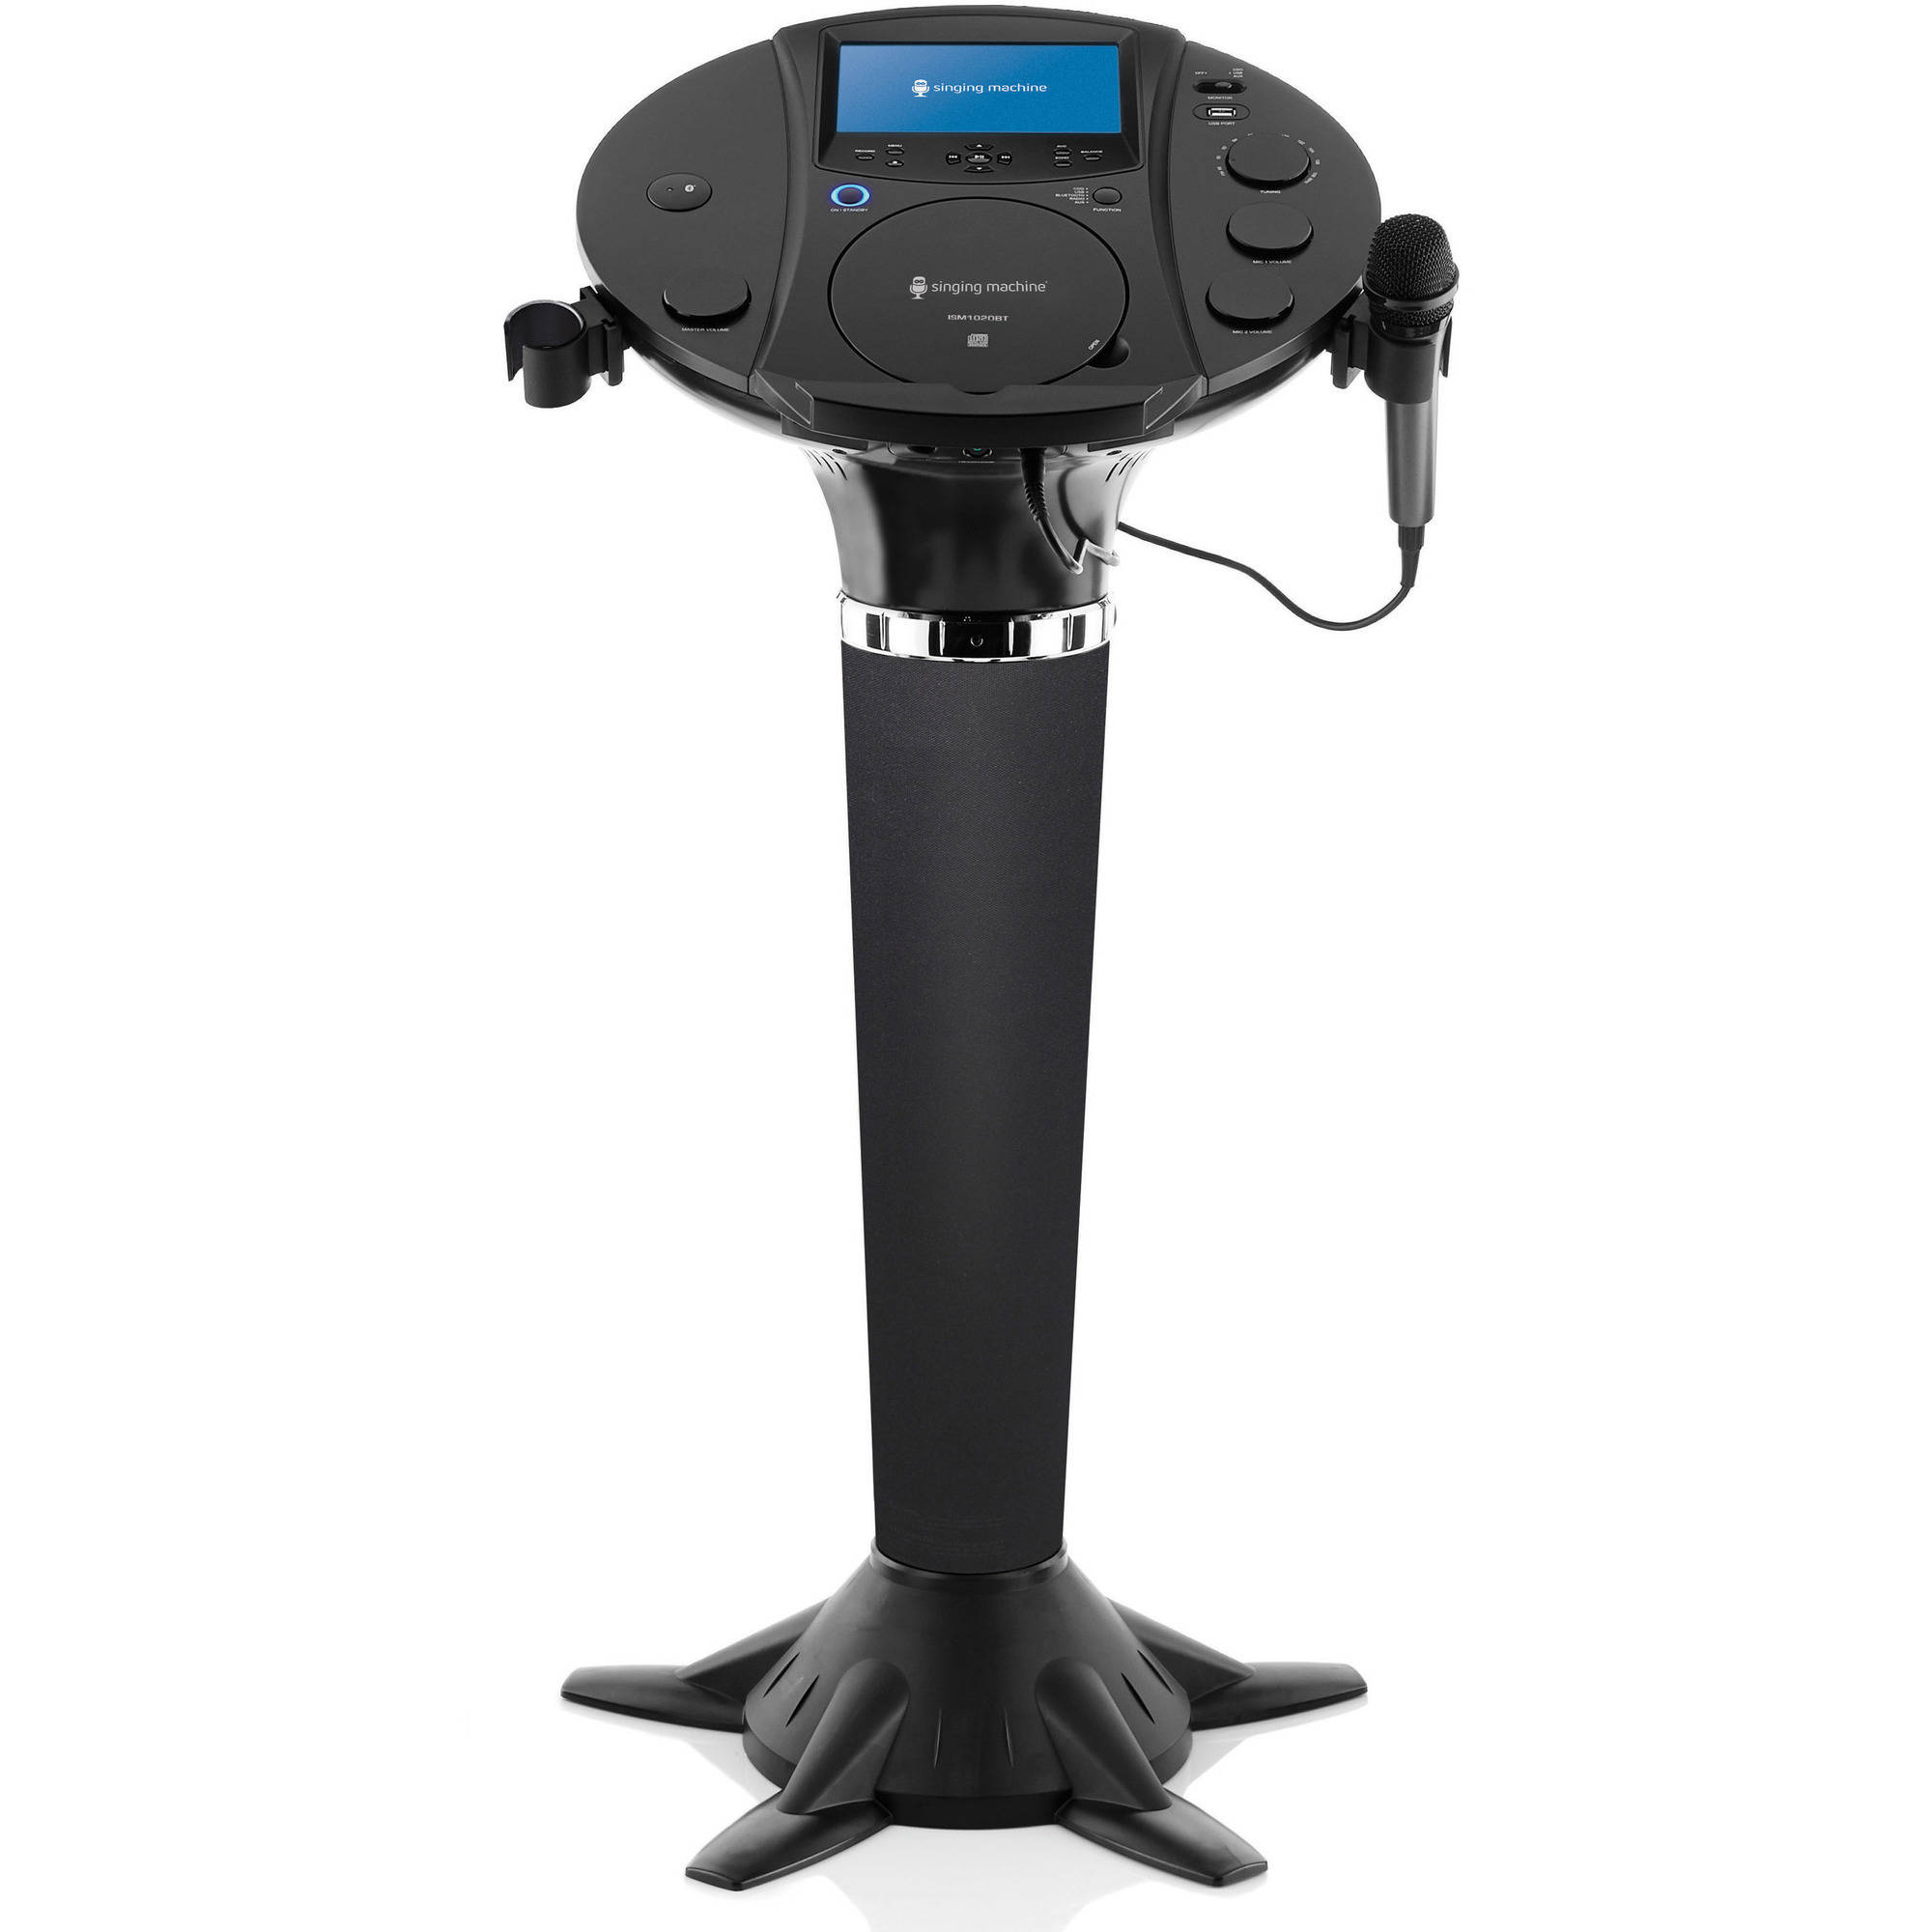 Singing Machine ISM1020BT Bluetooth Pedestal Karaoke by The Singing Machine